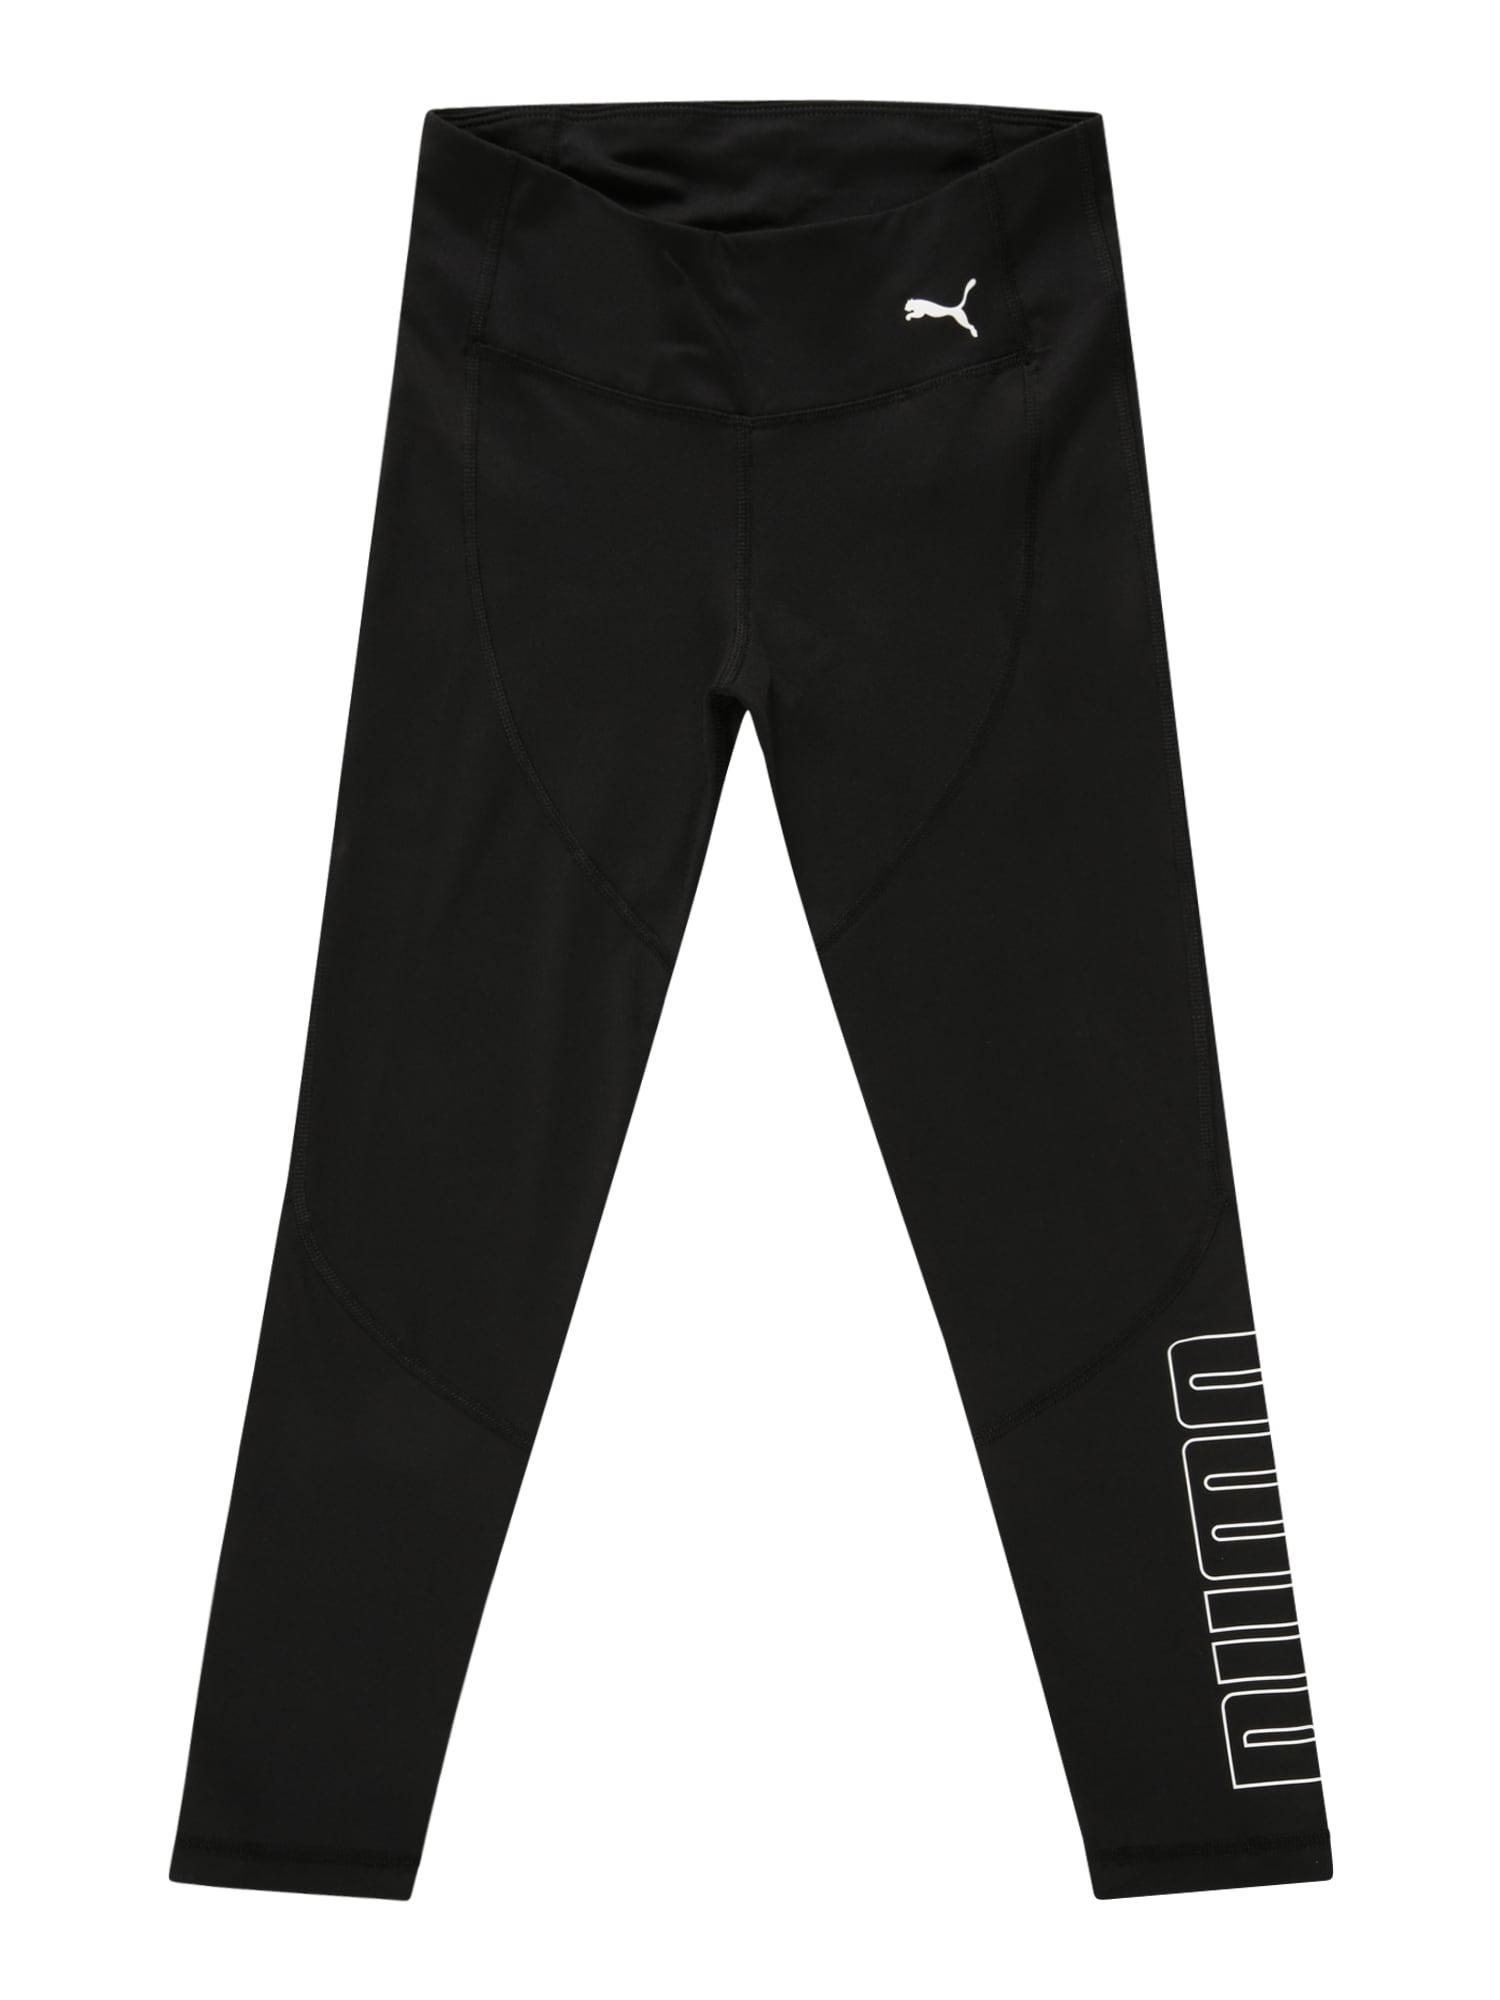 PUMA Leggings 'Runtrain 78'  - Noir - Taille: 176 - girl